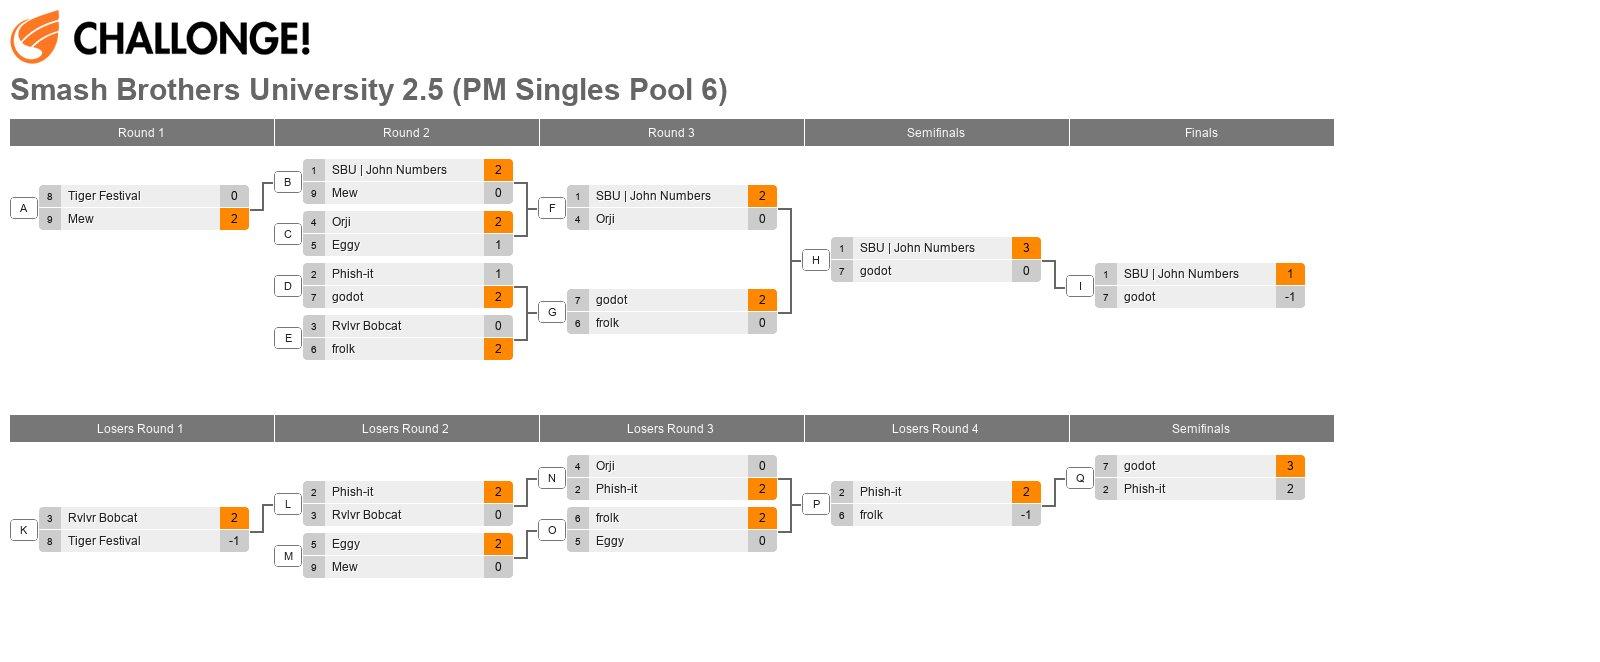 Smash Brothers University 2.5 (PM Singles Pool 6)